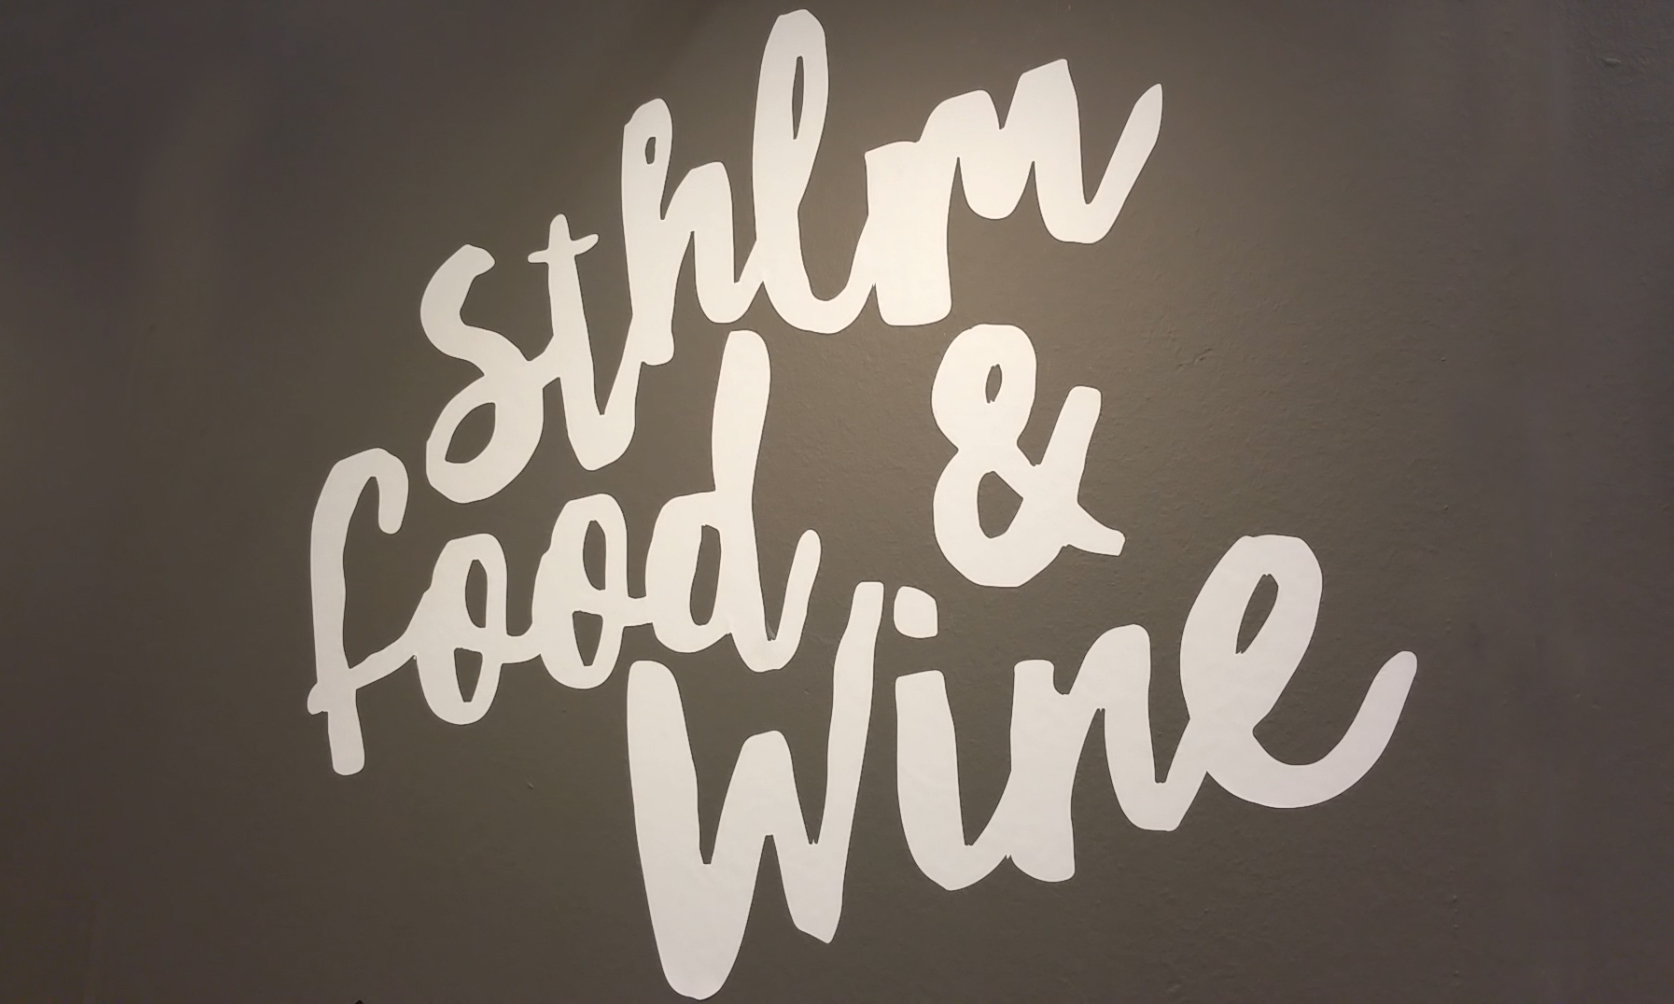 Sthlm Food & Wine, 9-12 november